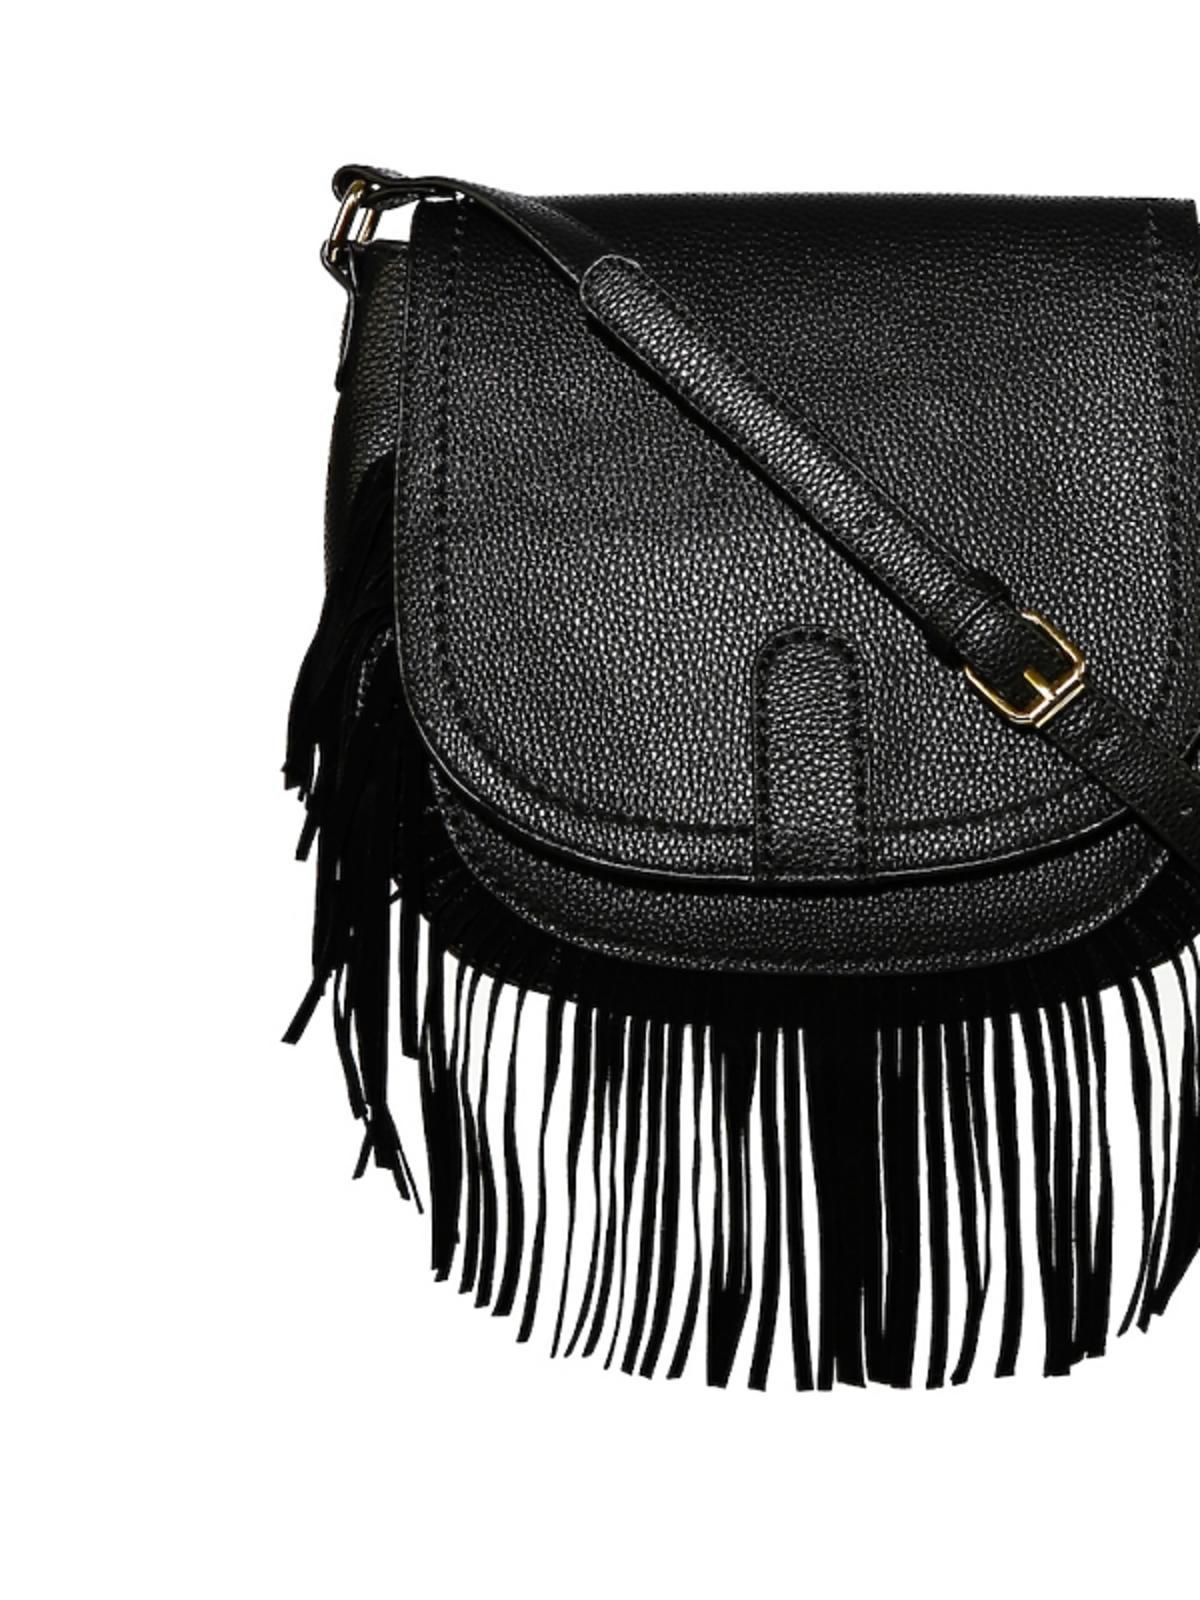 czarna torba z frędzlami na pasku